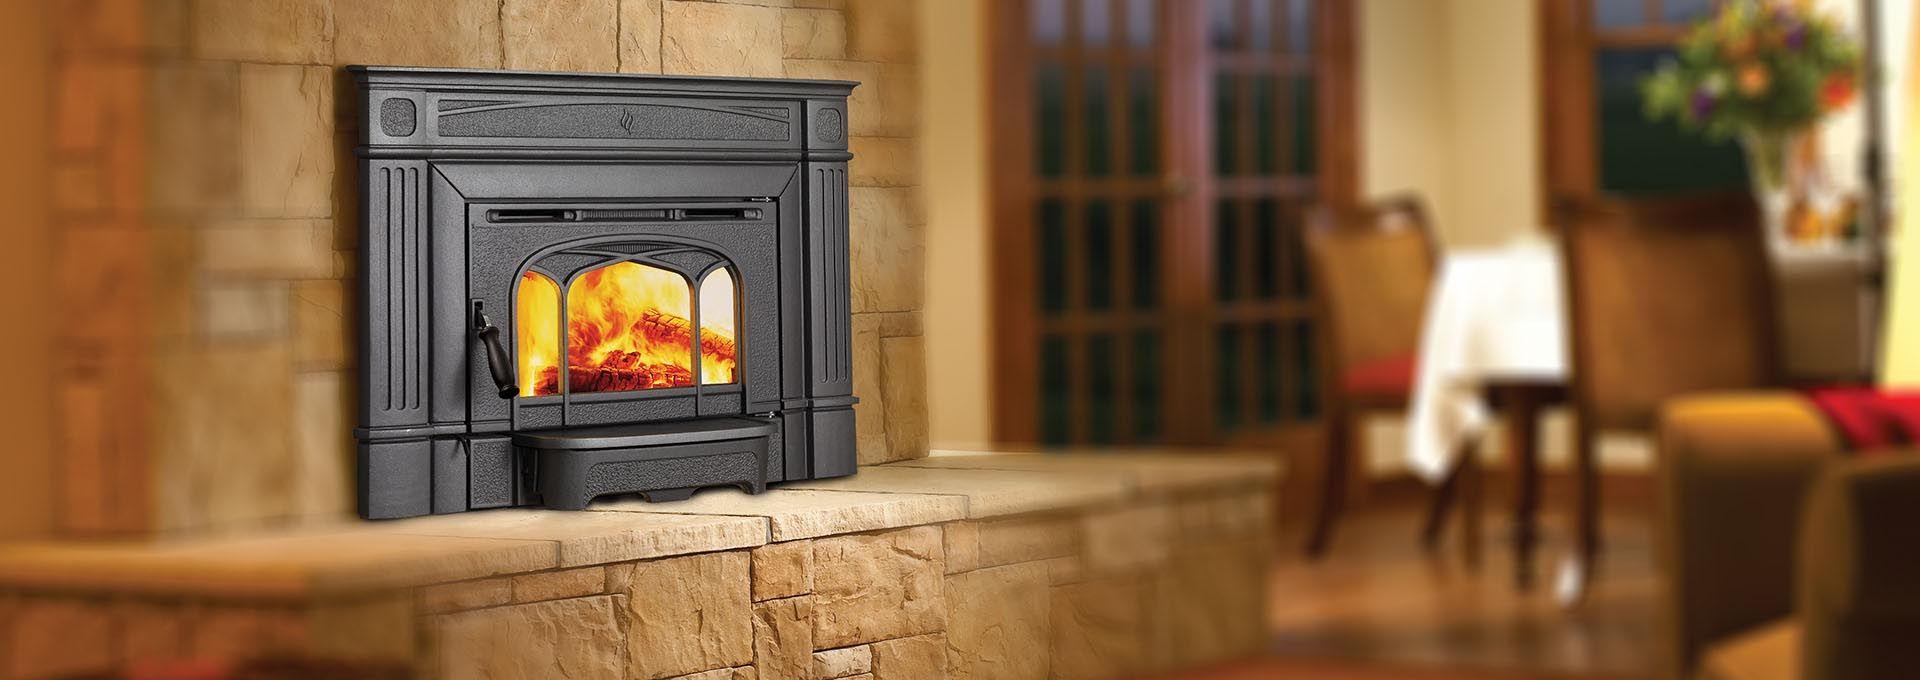 Regency Hi200 Shown With Metallic Black Finish Fireplace Stores Wood Wood Insert